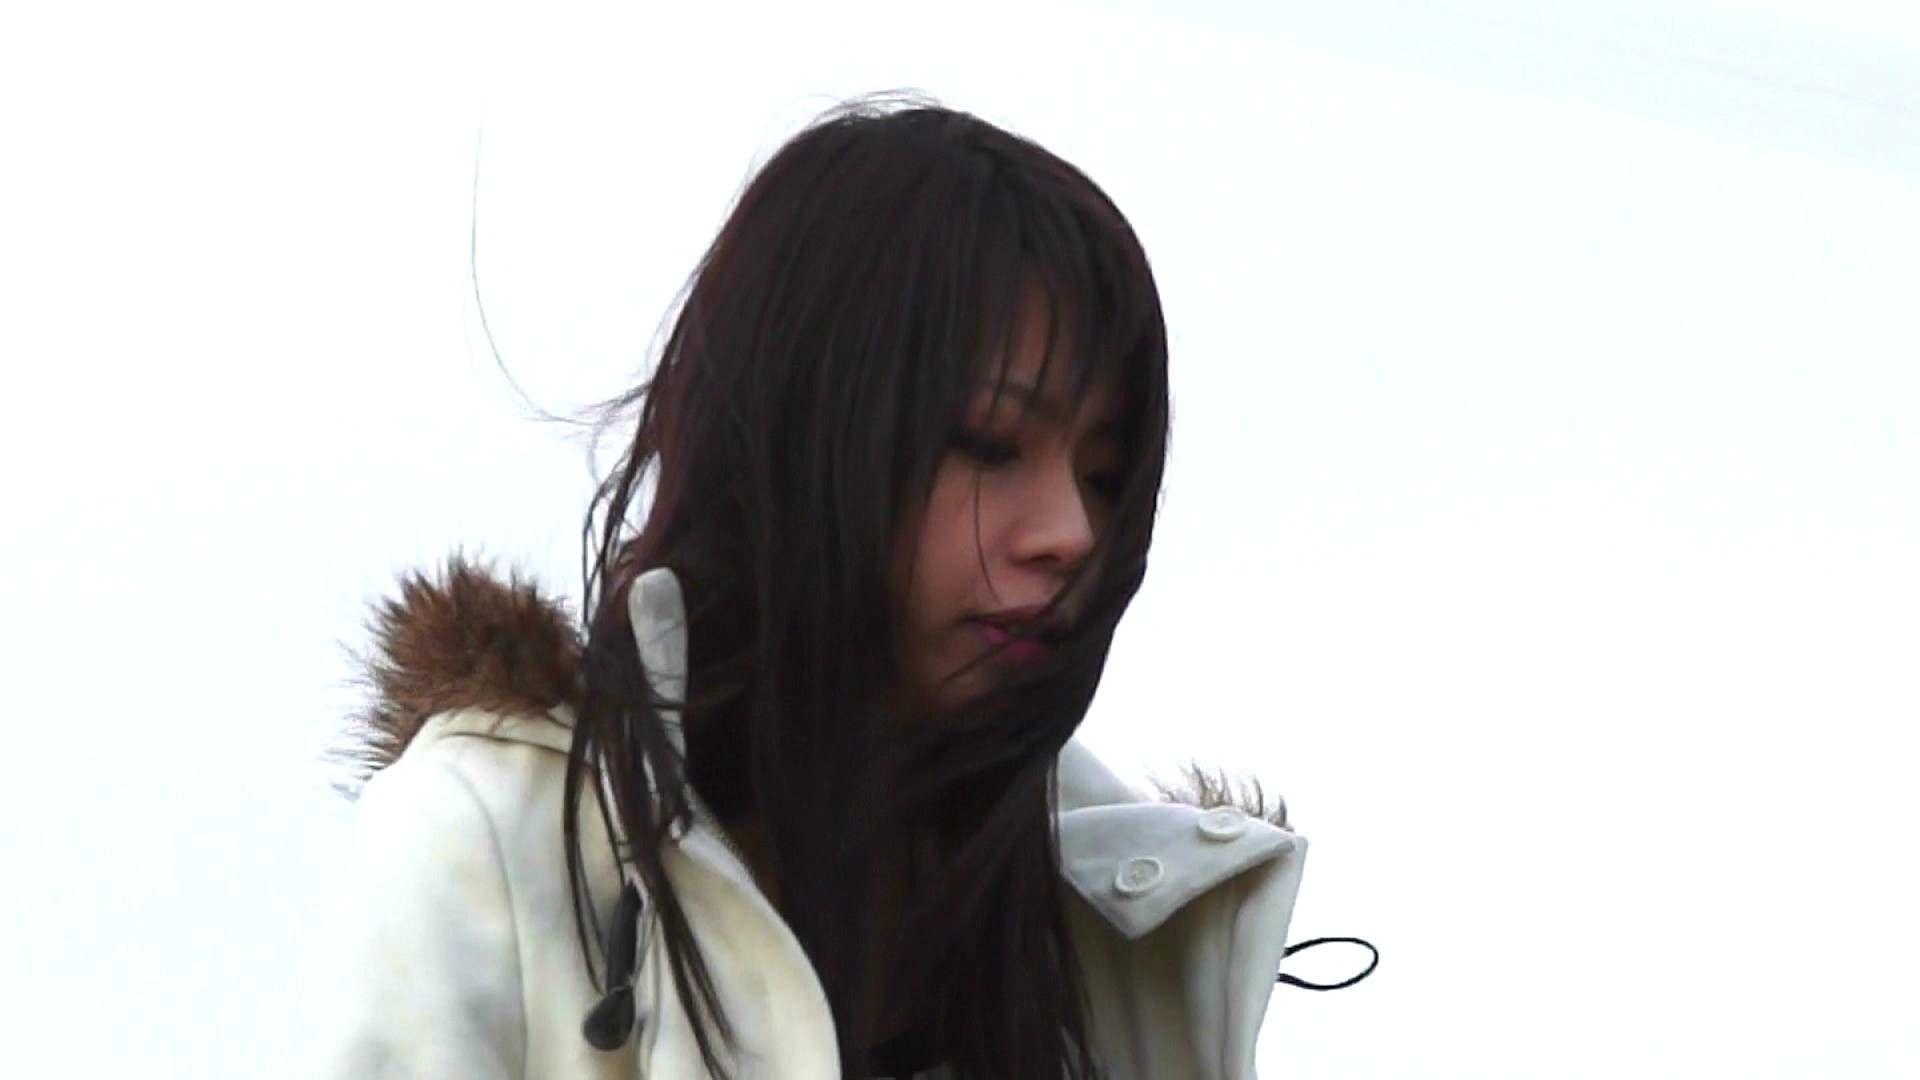 vol.2 自宅近く思い出の地で黄昏る志穂さん OLのボディ  83PIX 64